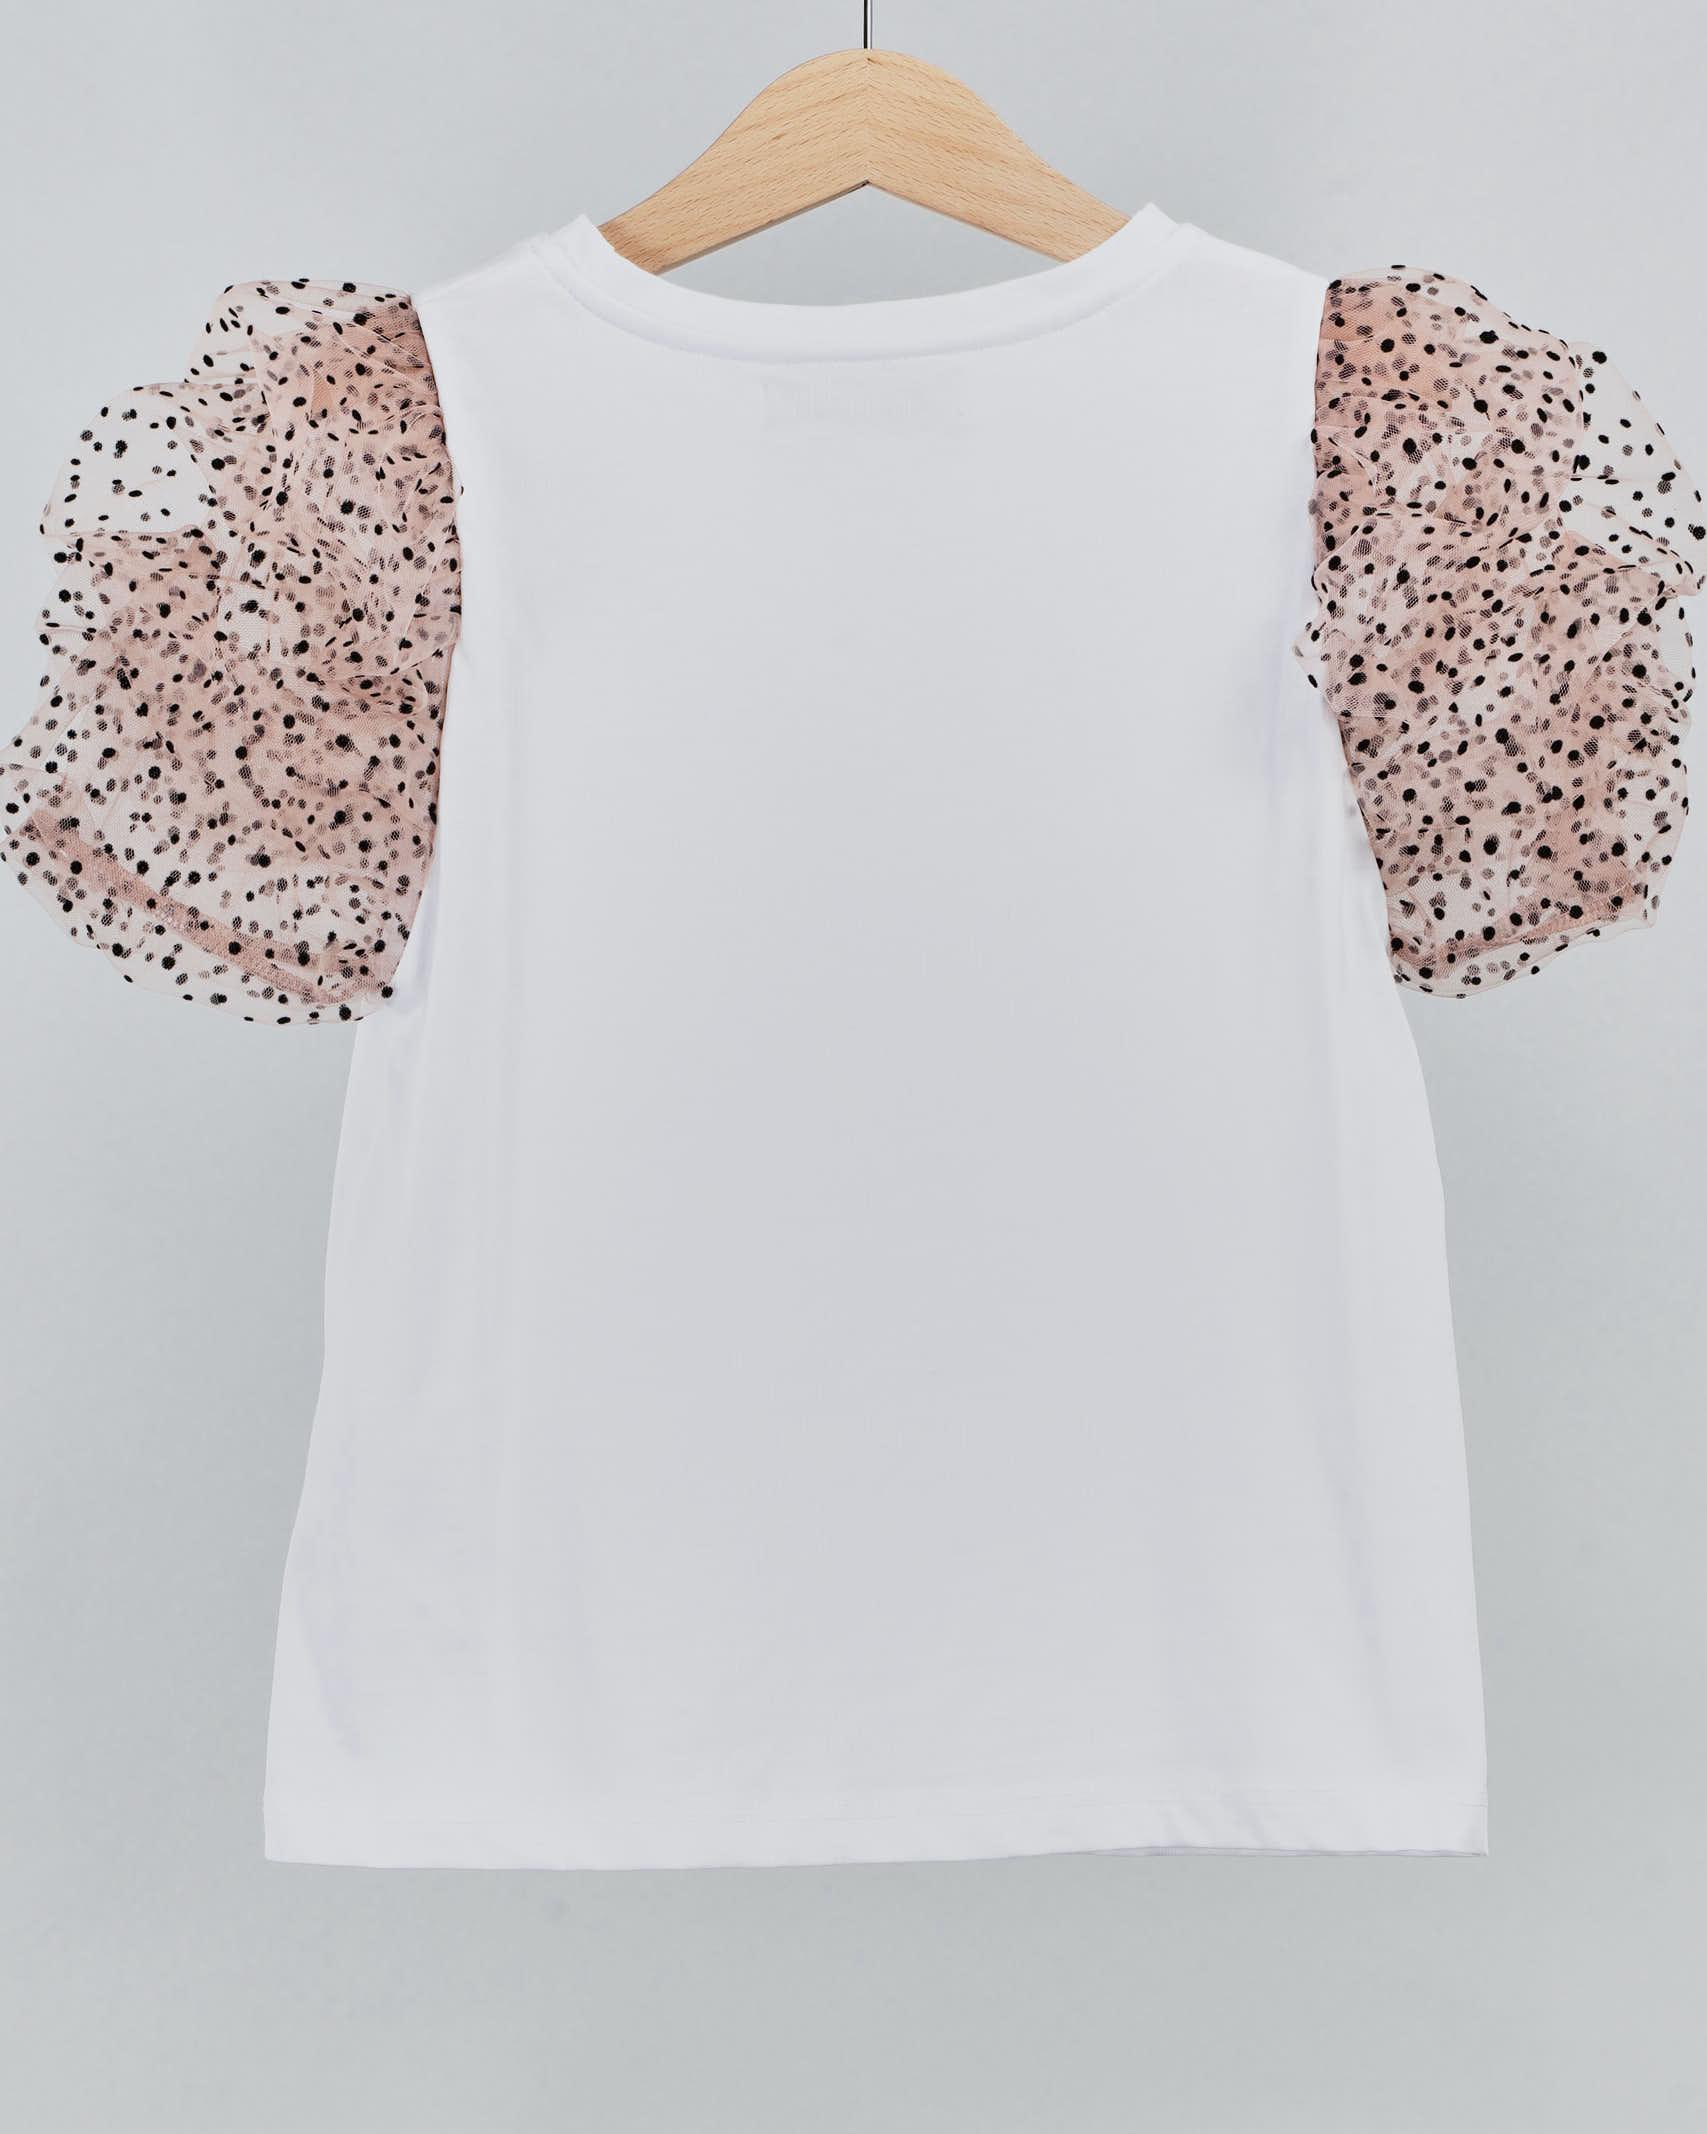 T-shirt con stampa logo e maniche in tulle Aniye By Girl ANIYE BY GIRL | T-shirt | 1150301370